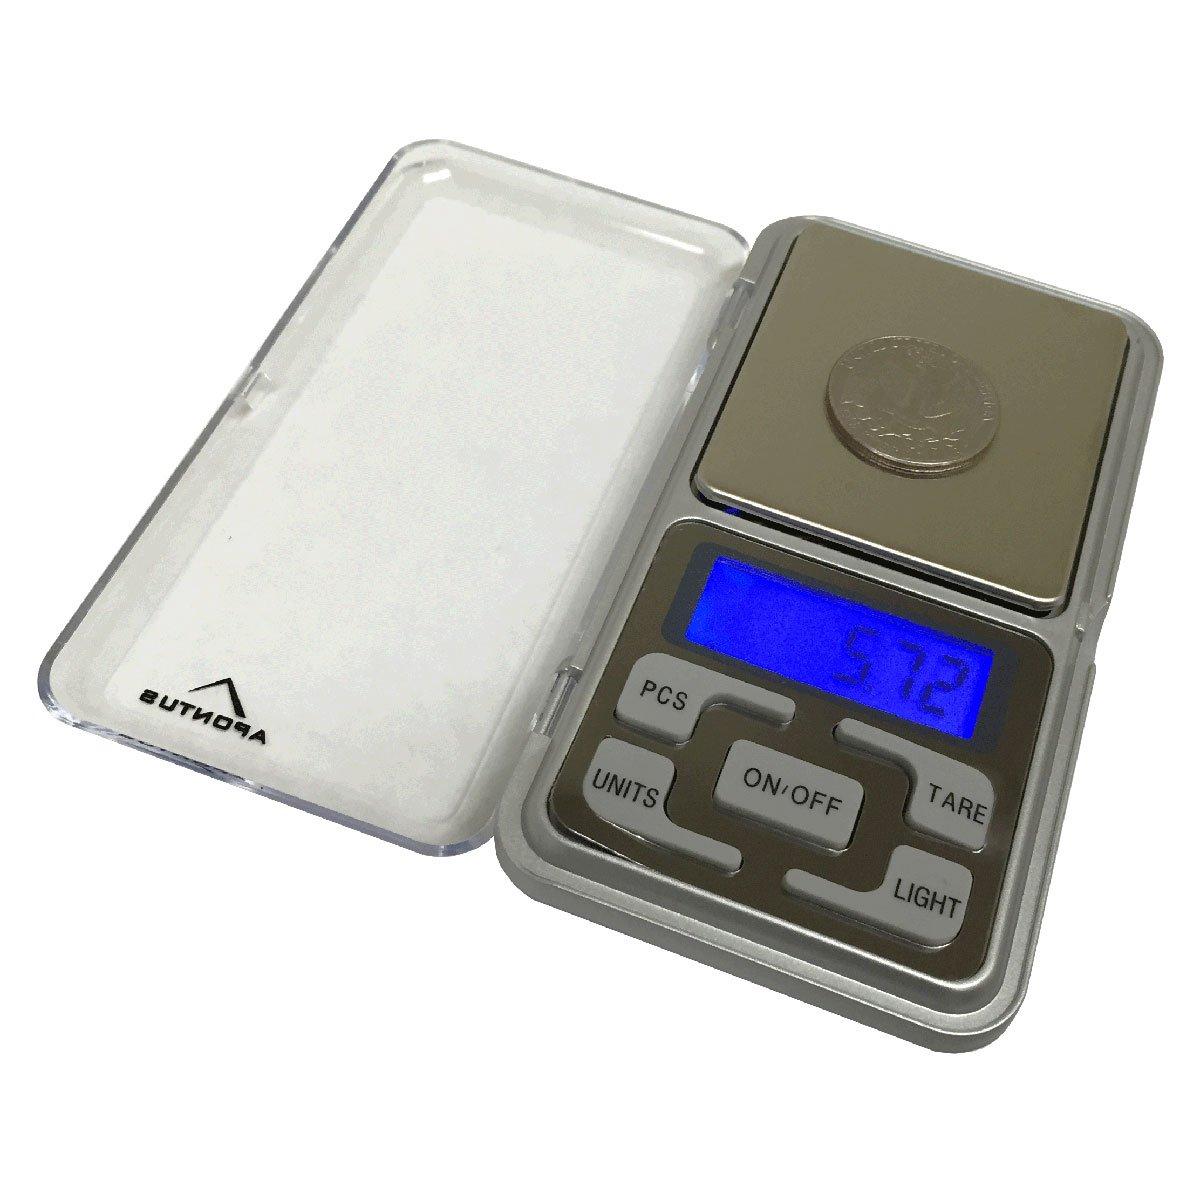 Amazon.com: Apontus Digital Pocket Jewelry Scale, Backlit Display ...